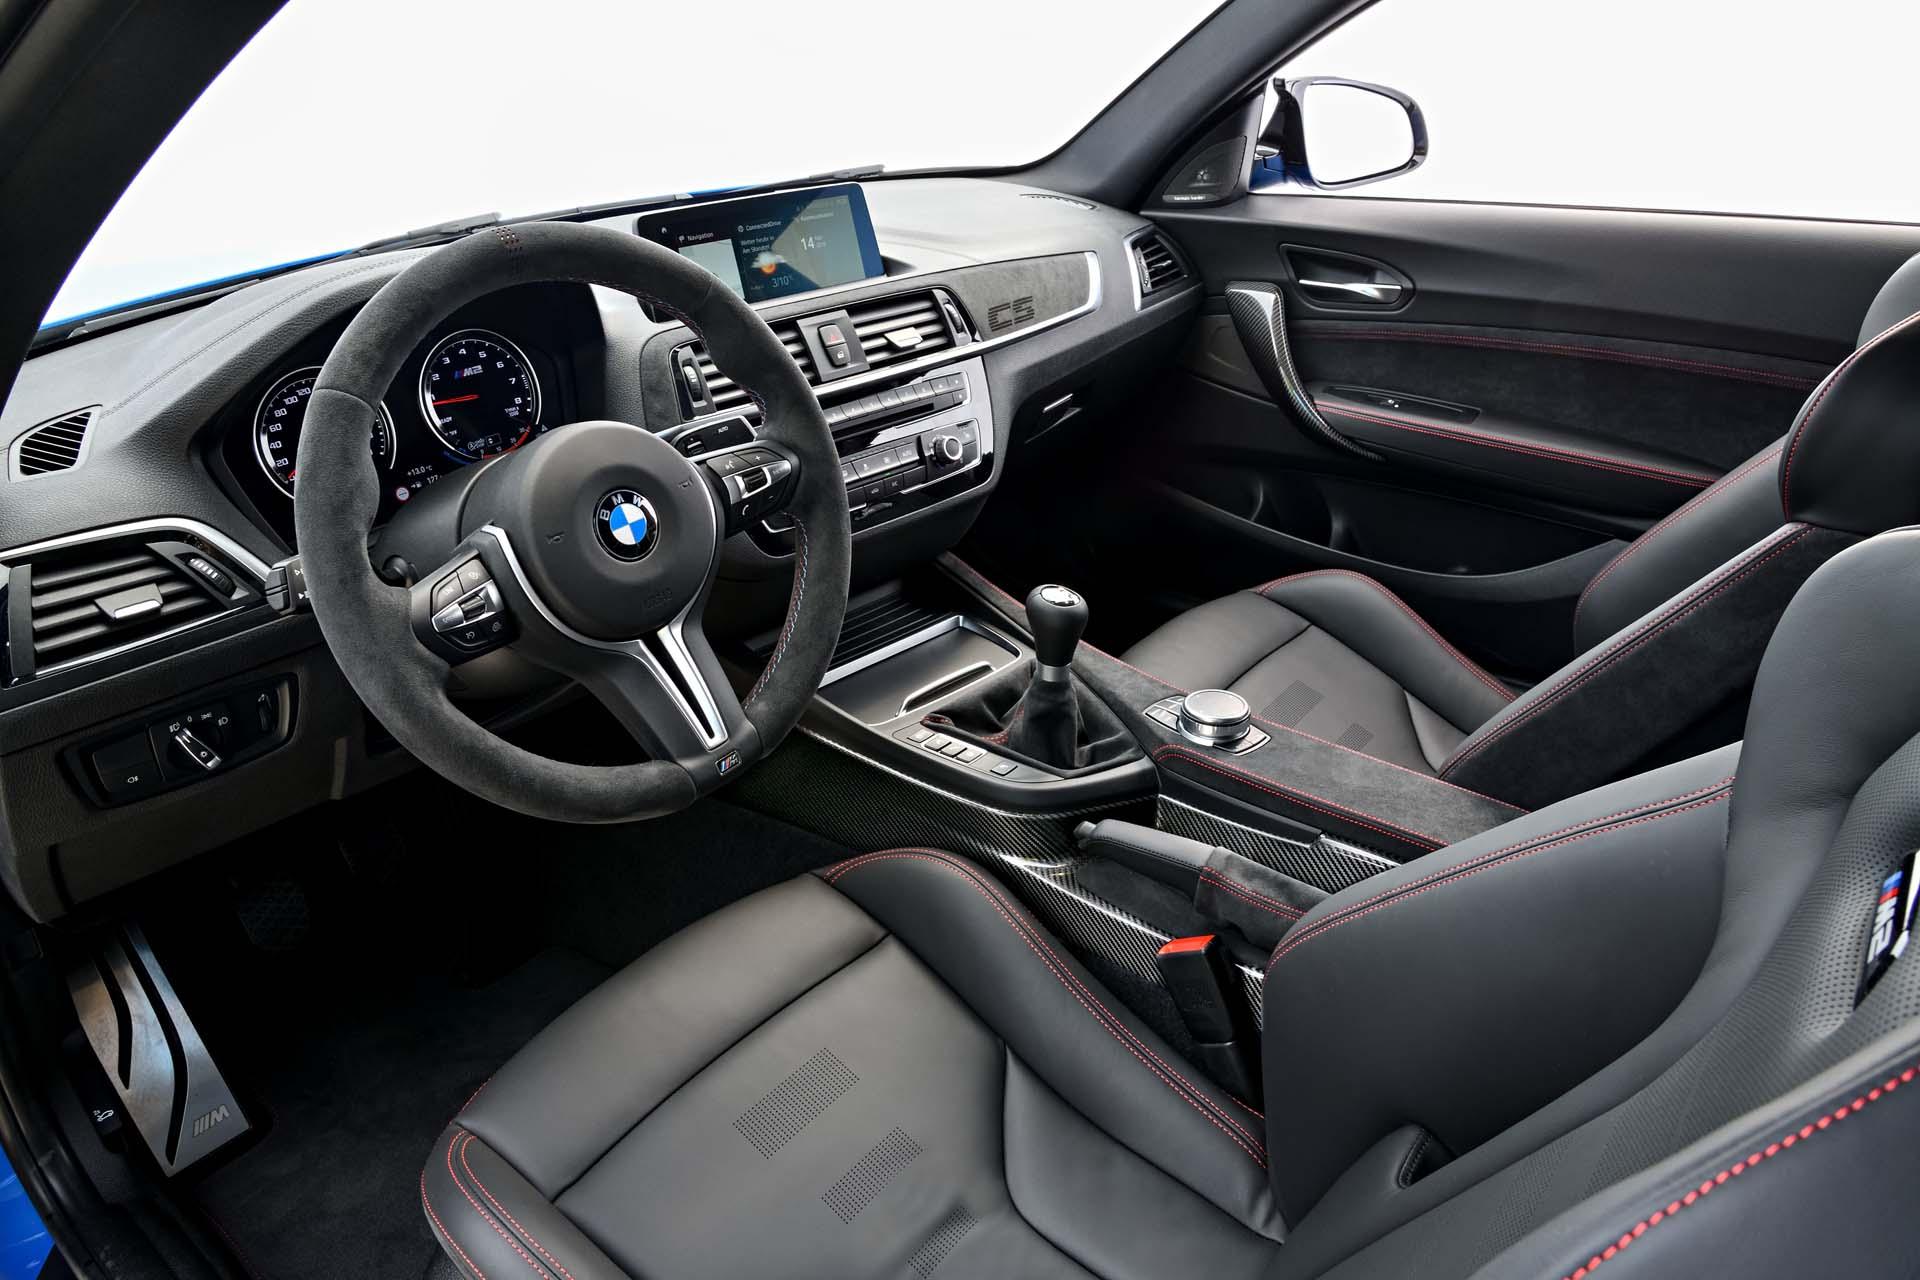 2016 - [BMW] M2 [F87] - Page 11 2020-bmw-2-series_100722791_h